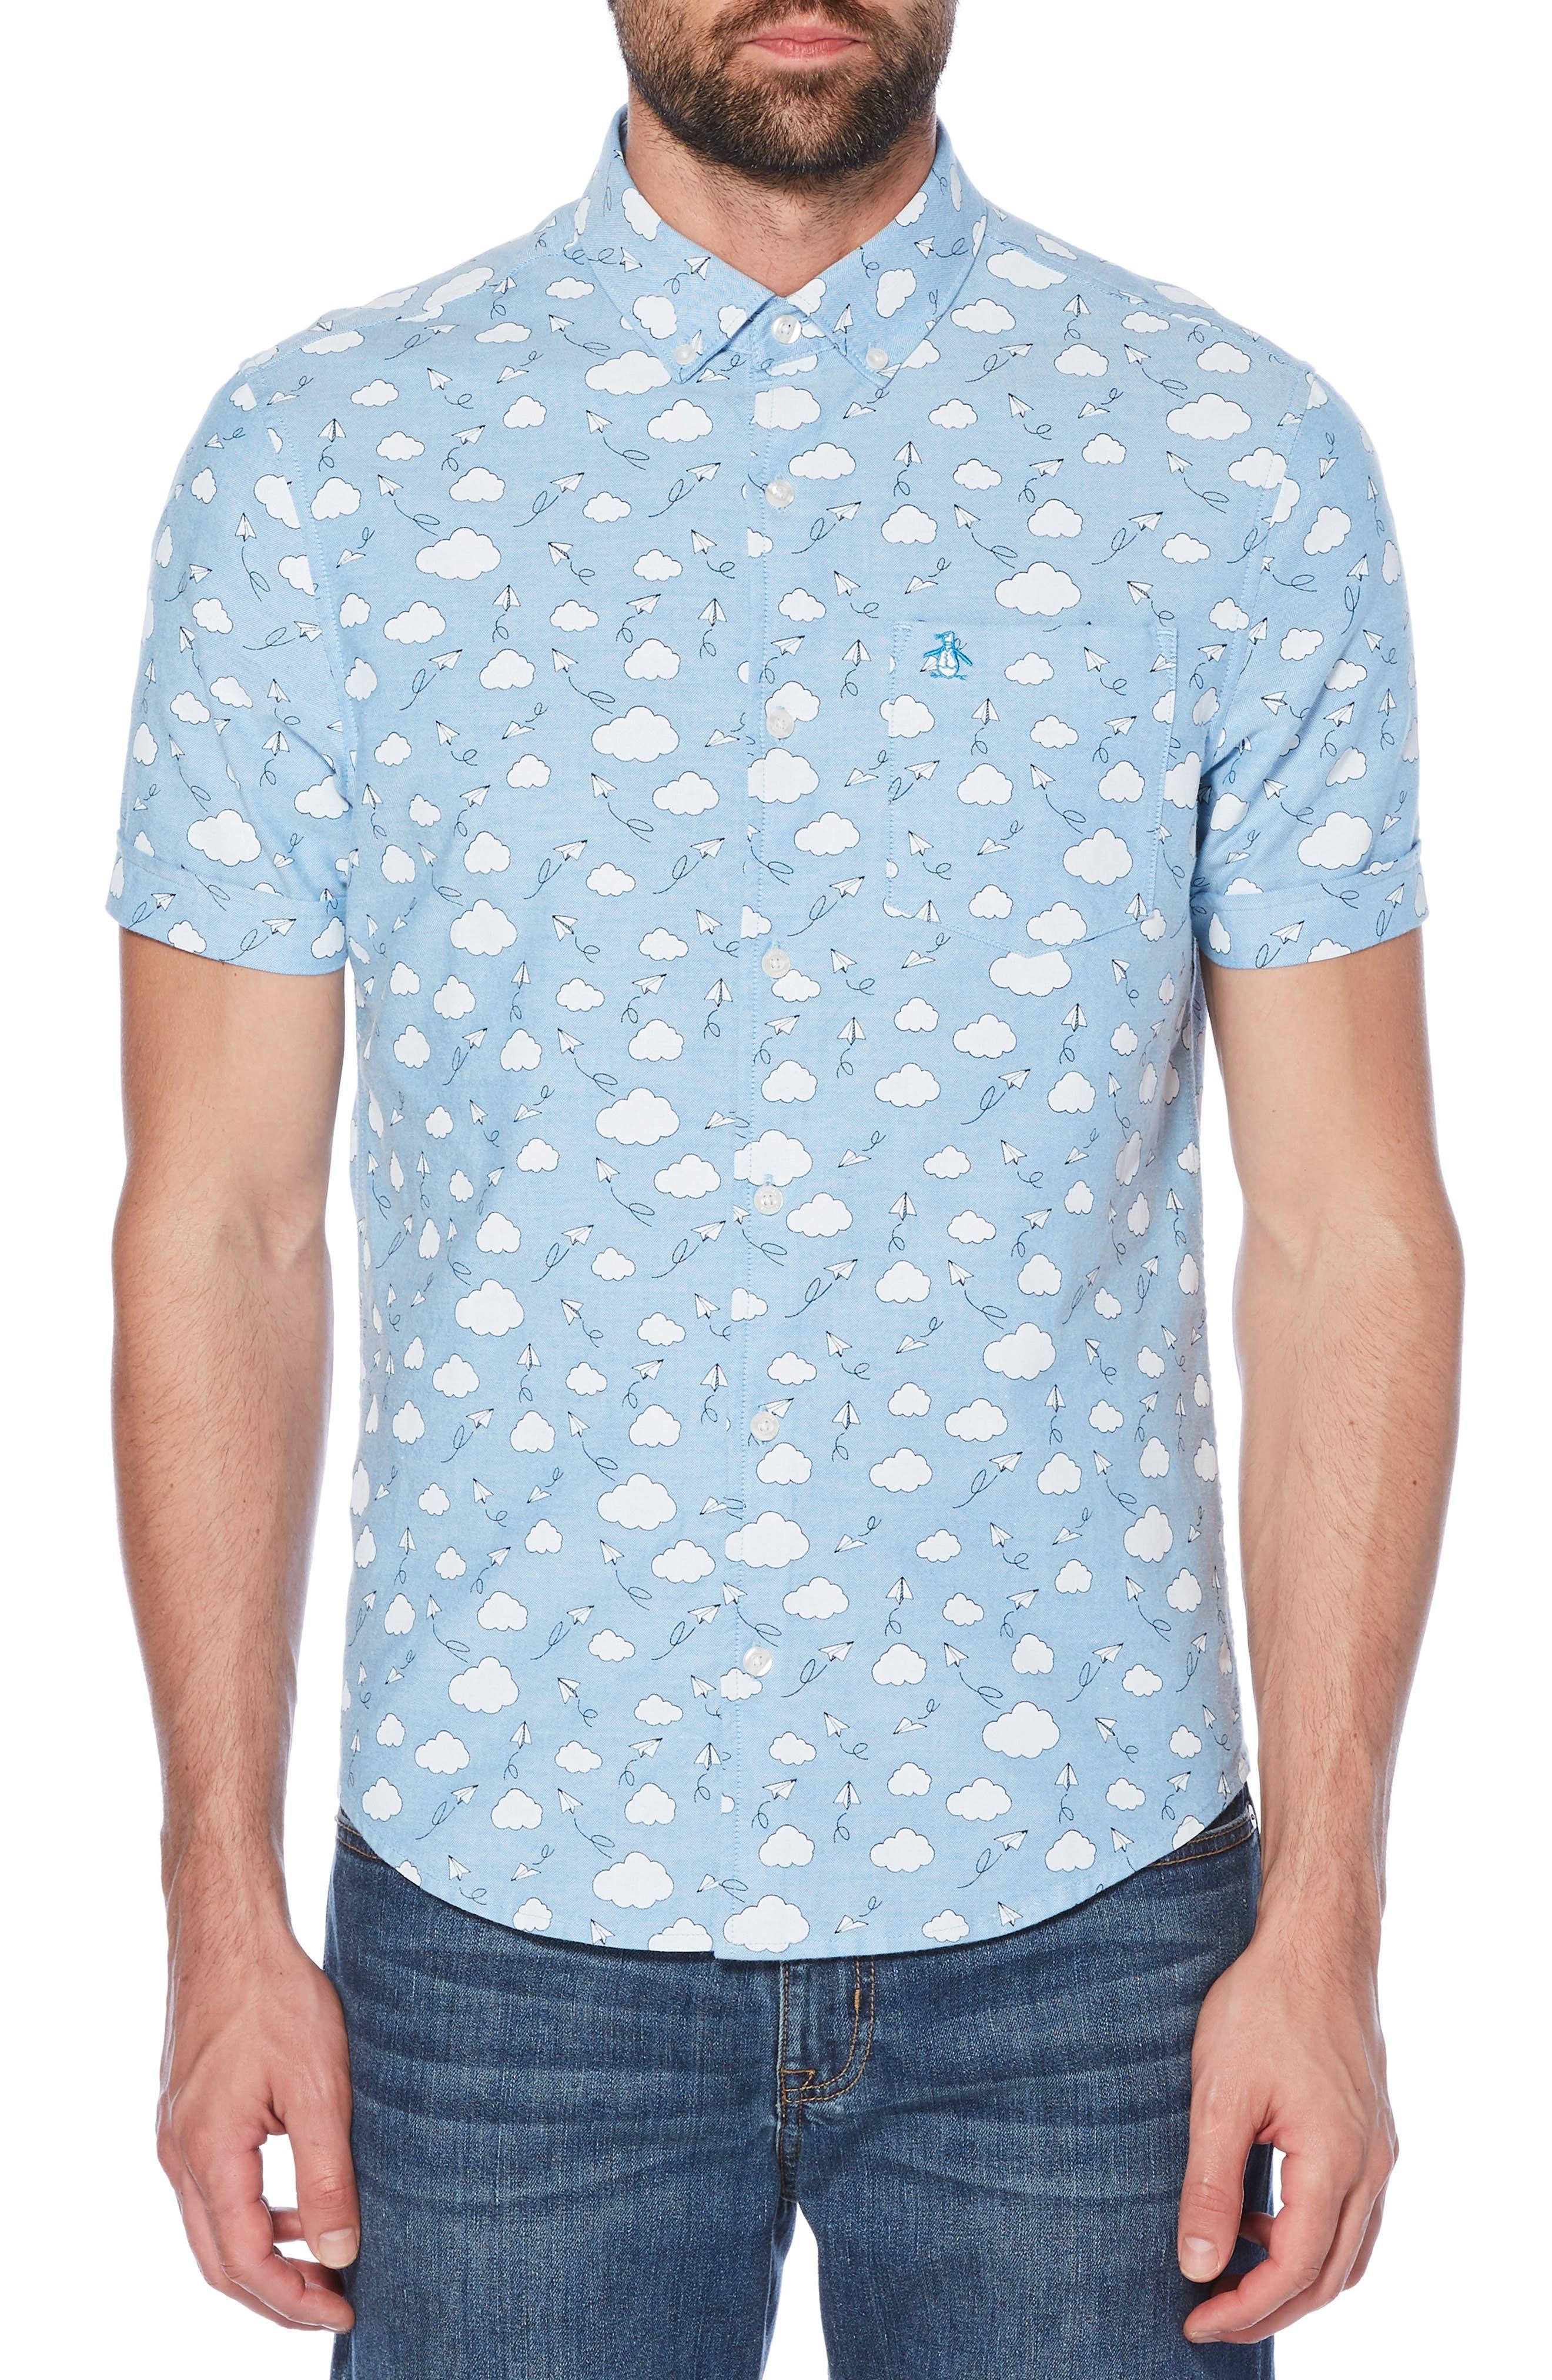 Cloud Print Oxford Shirt,                             Main thumbnail 1, color,                             DIVA BLUE